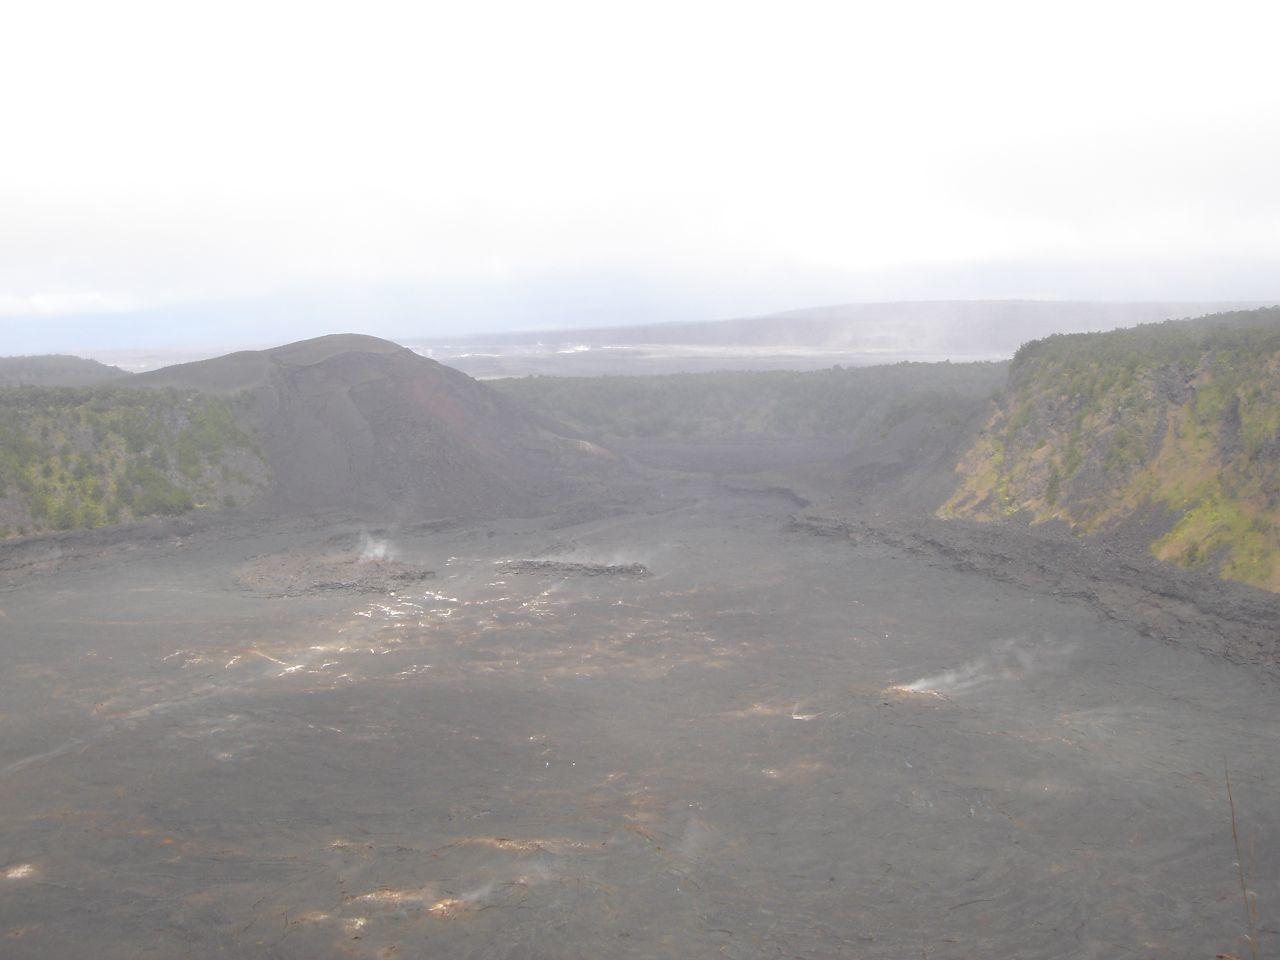 Lava landscape in Hawaii